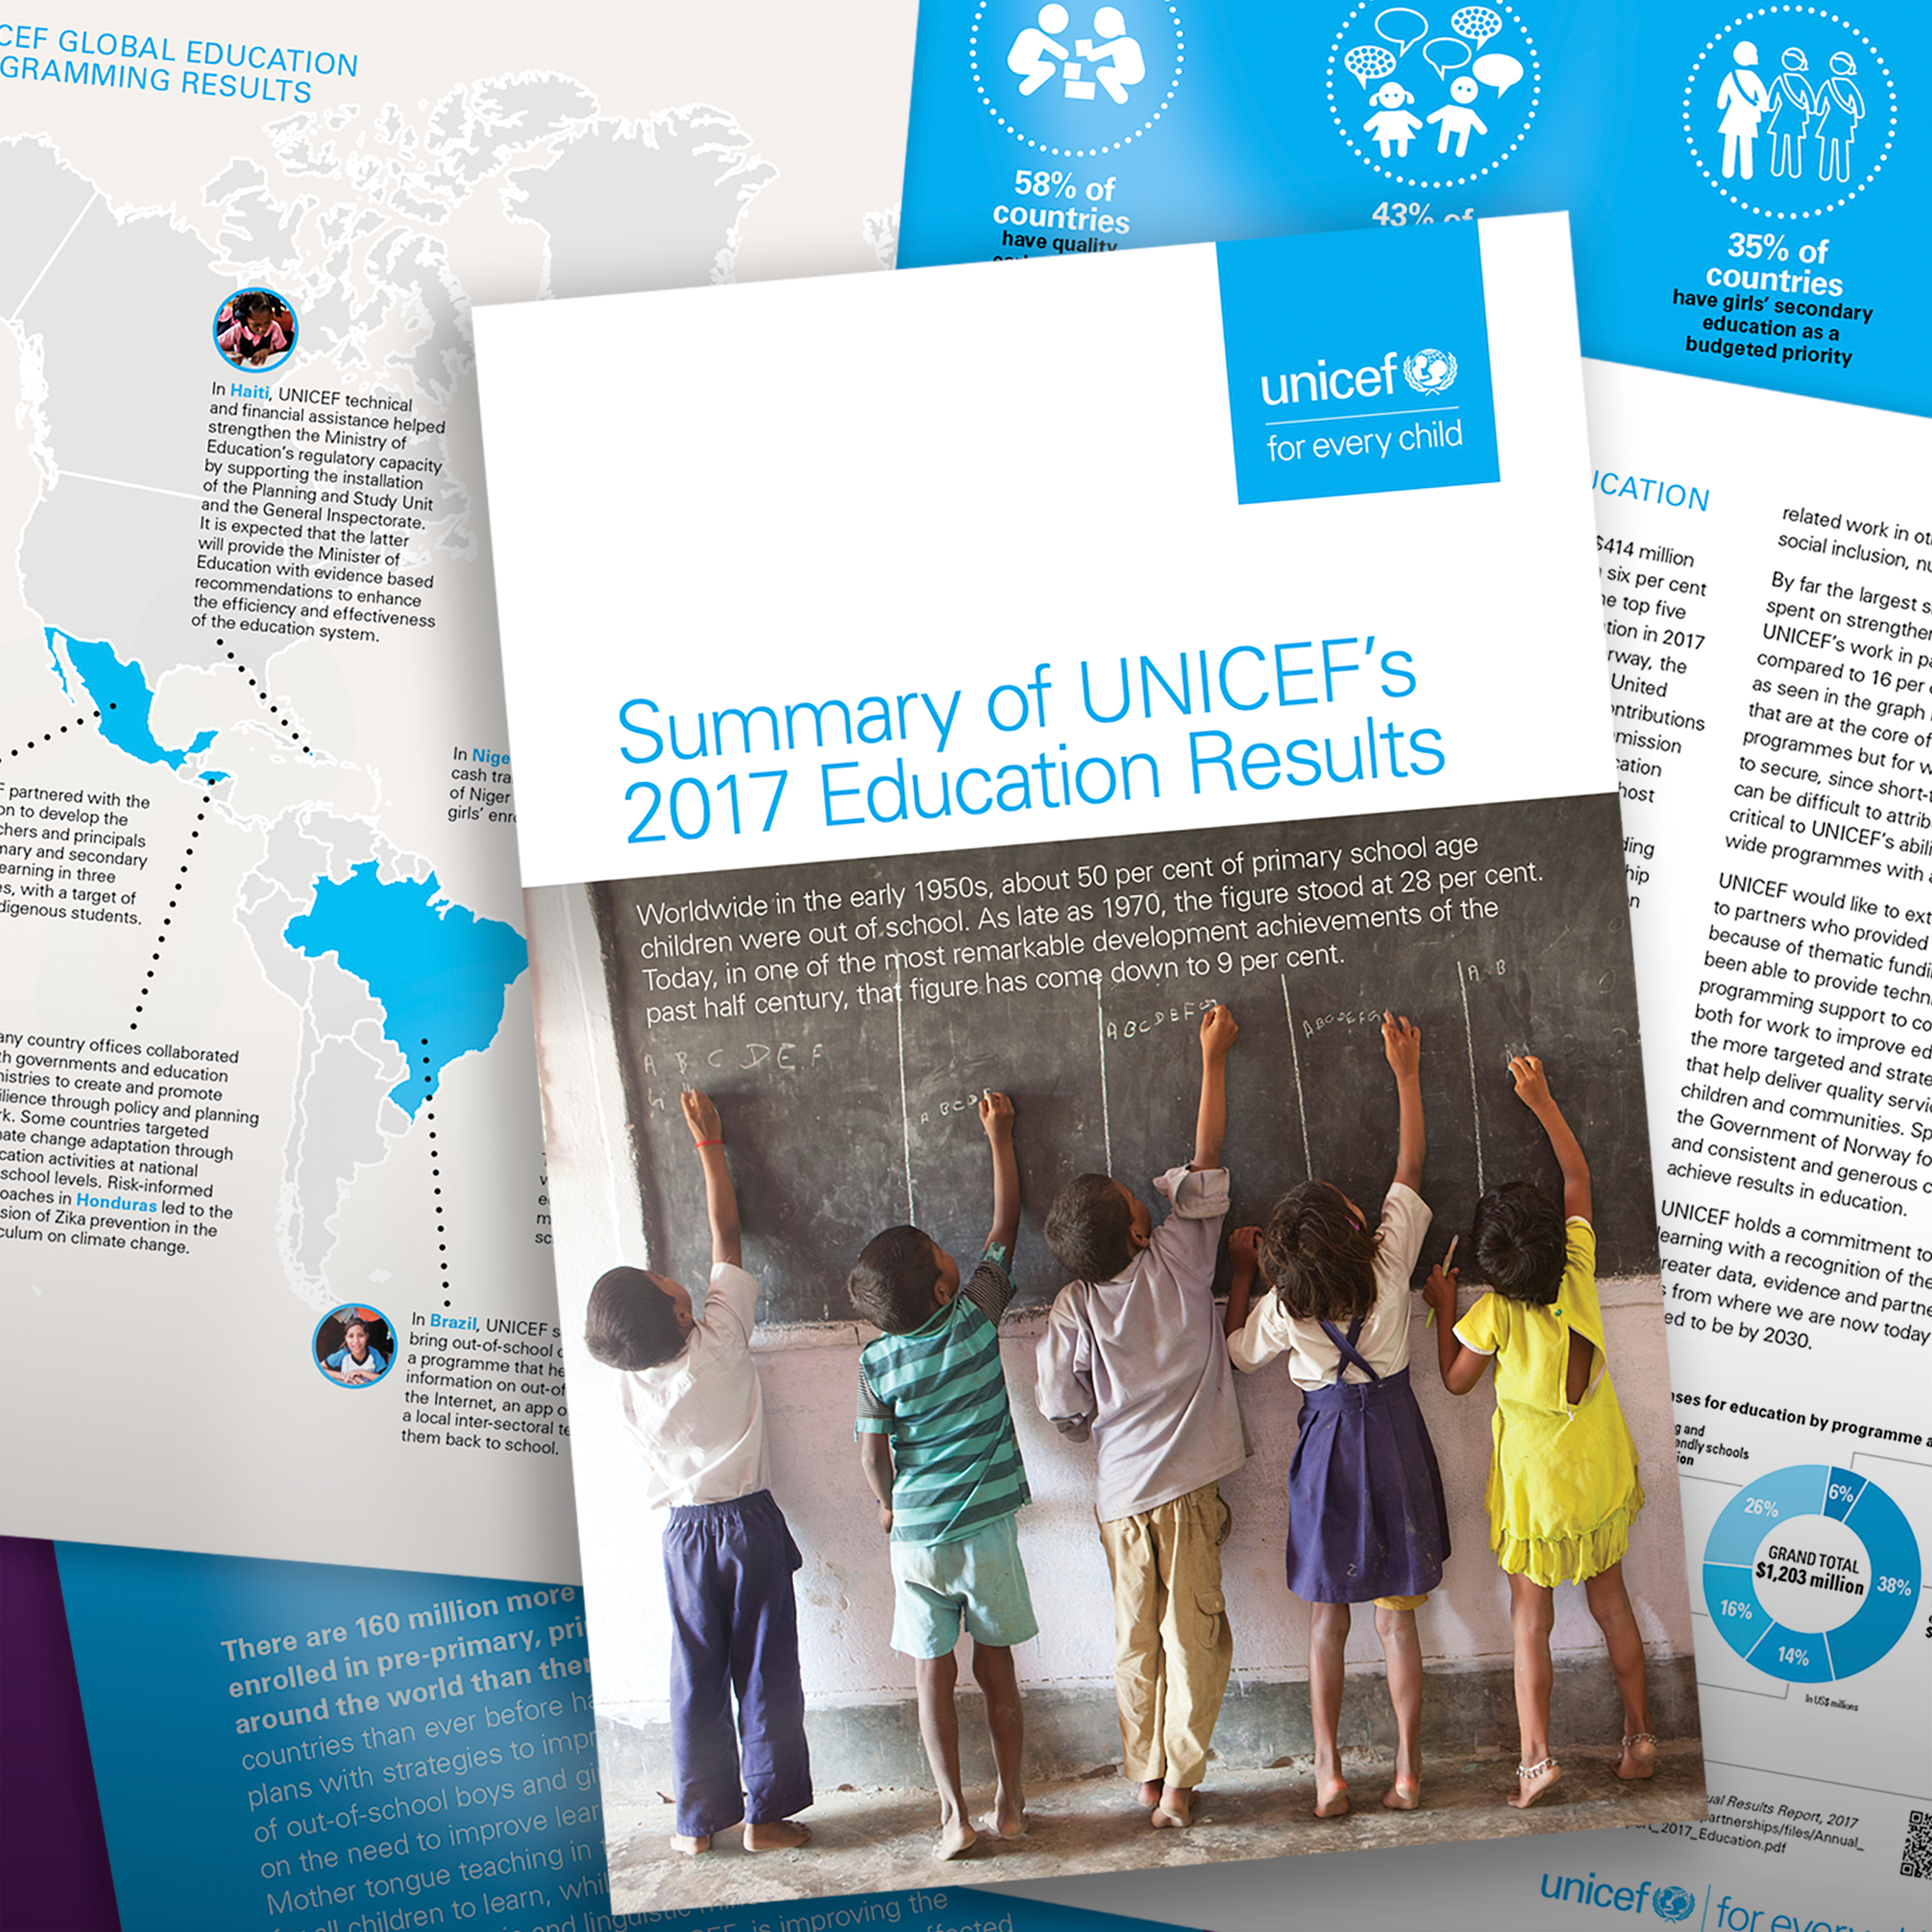 Brochure for UNICEF's Education Division highlighting 2017 data